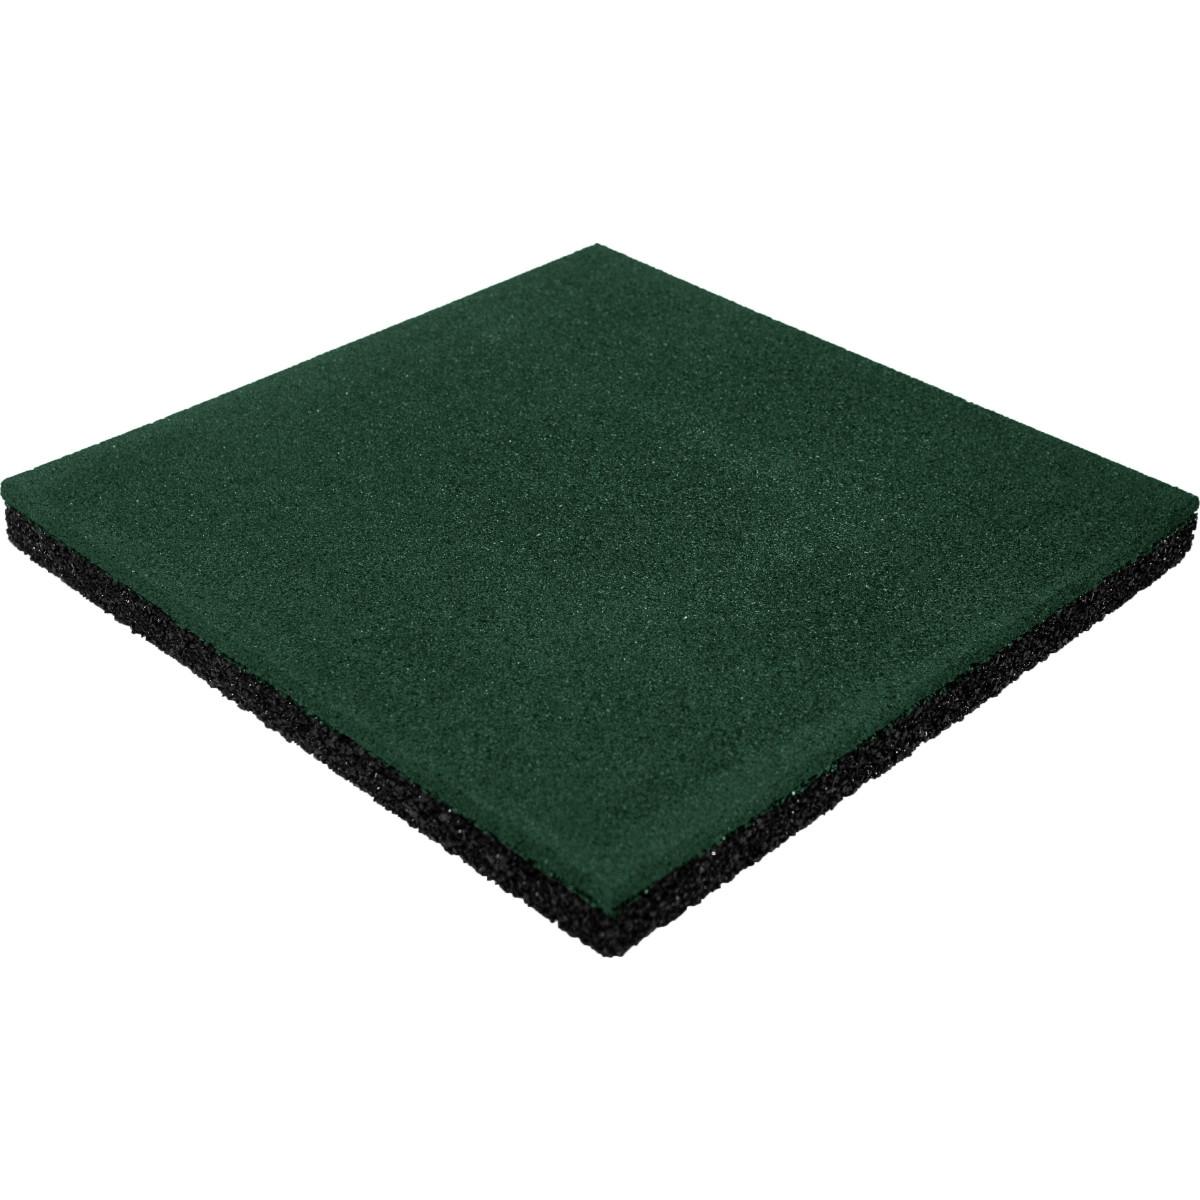 Плитка резиновая 500х500х40 пуансон зеленый